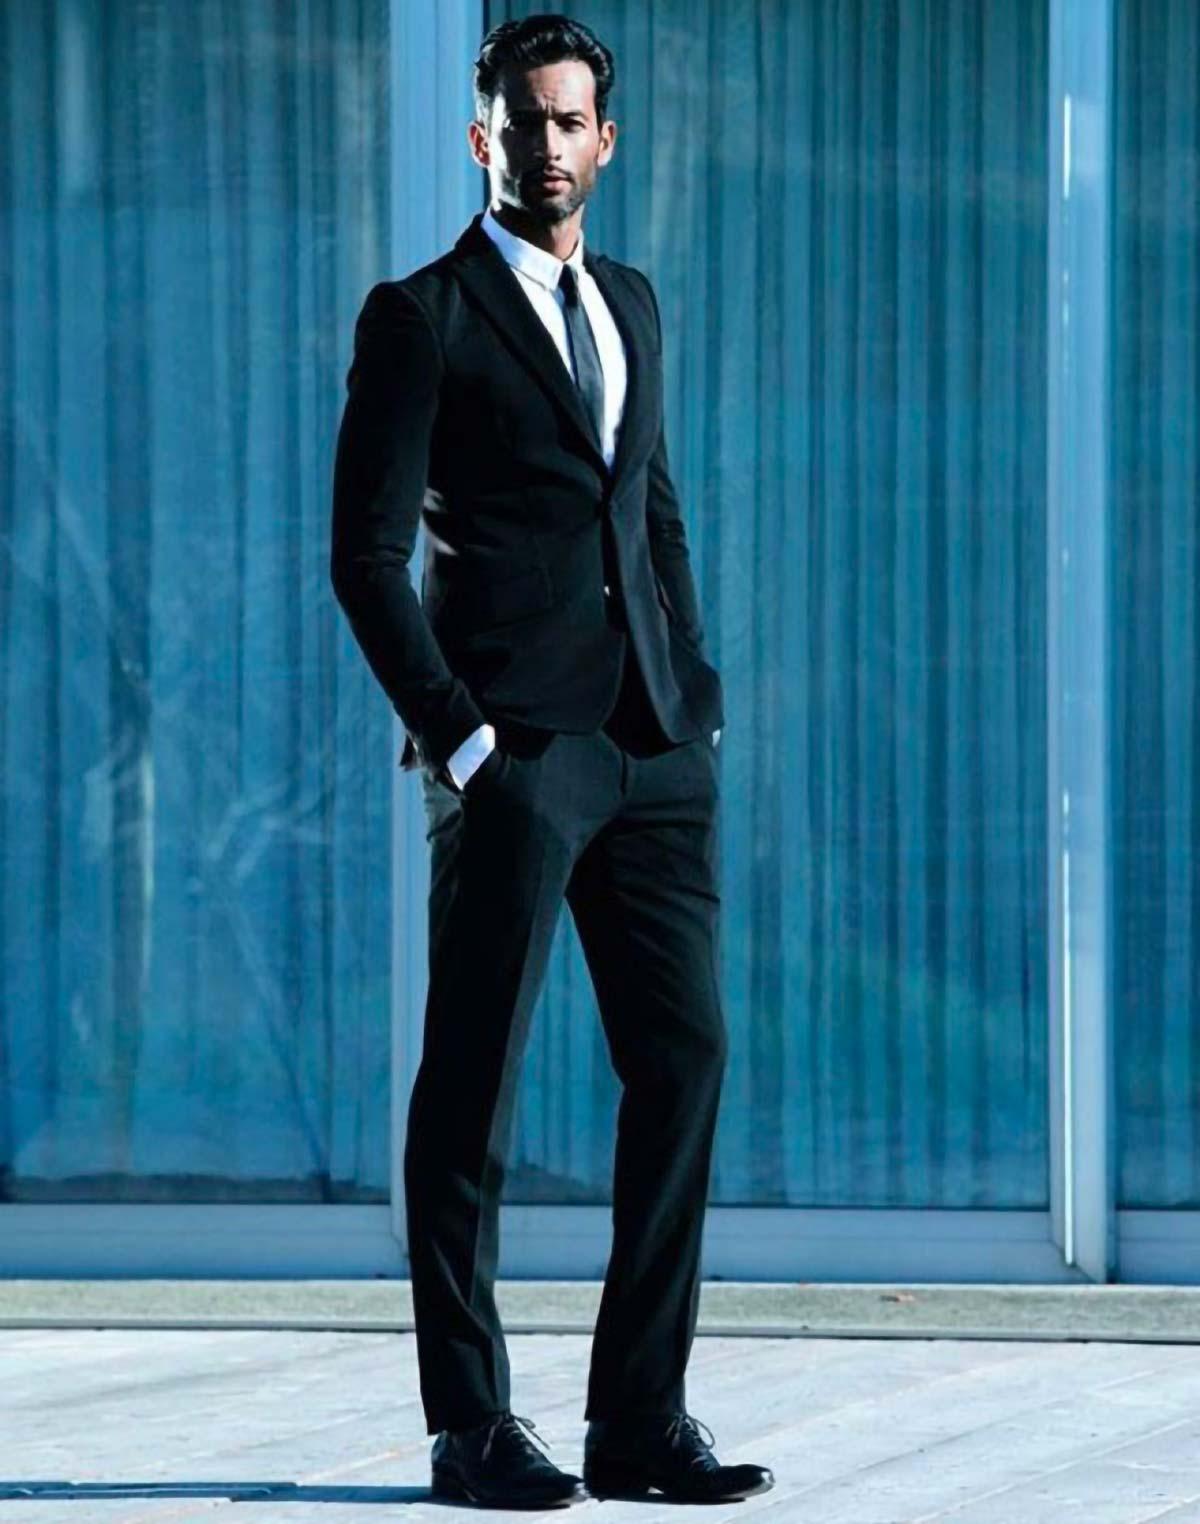 David - I am management